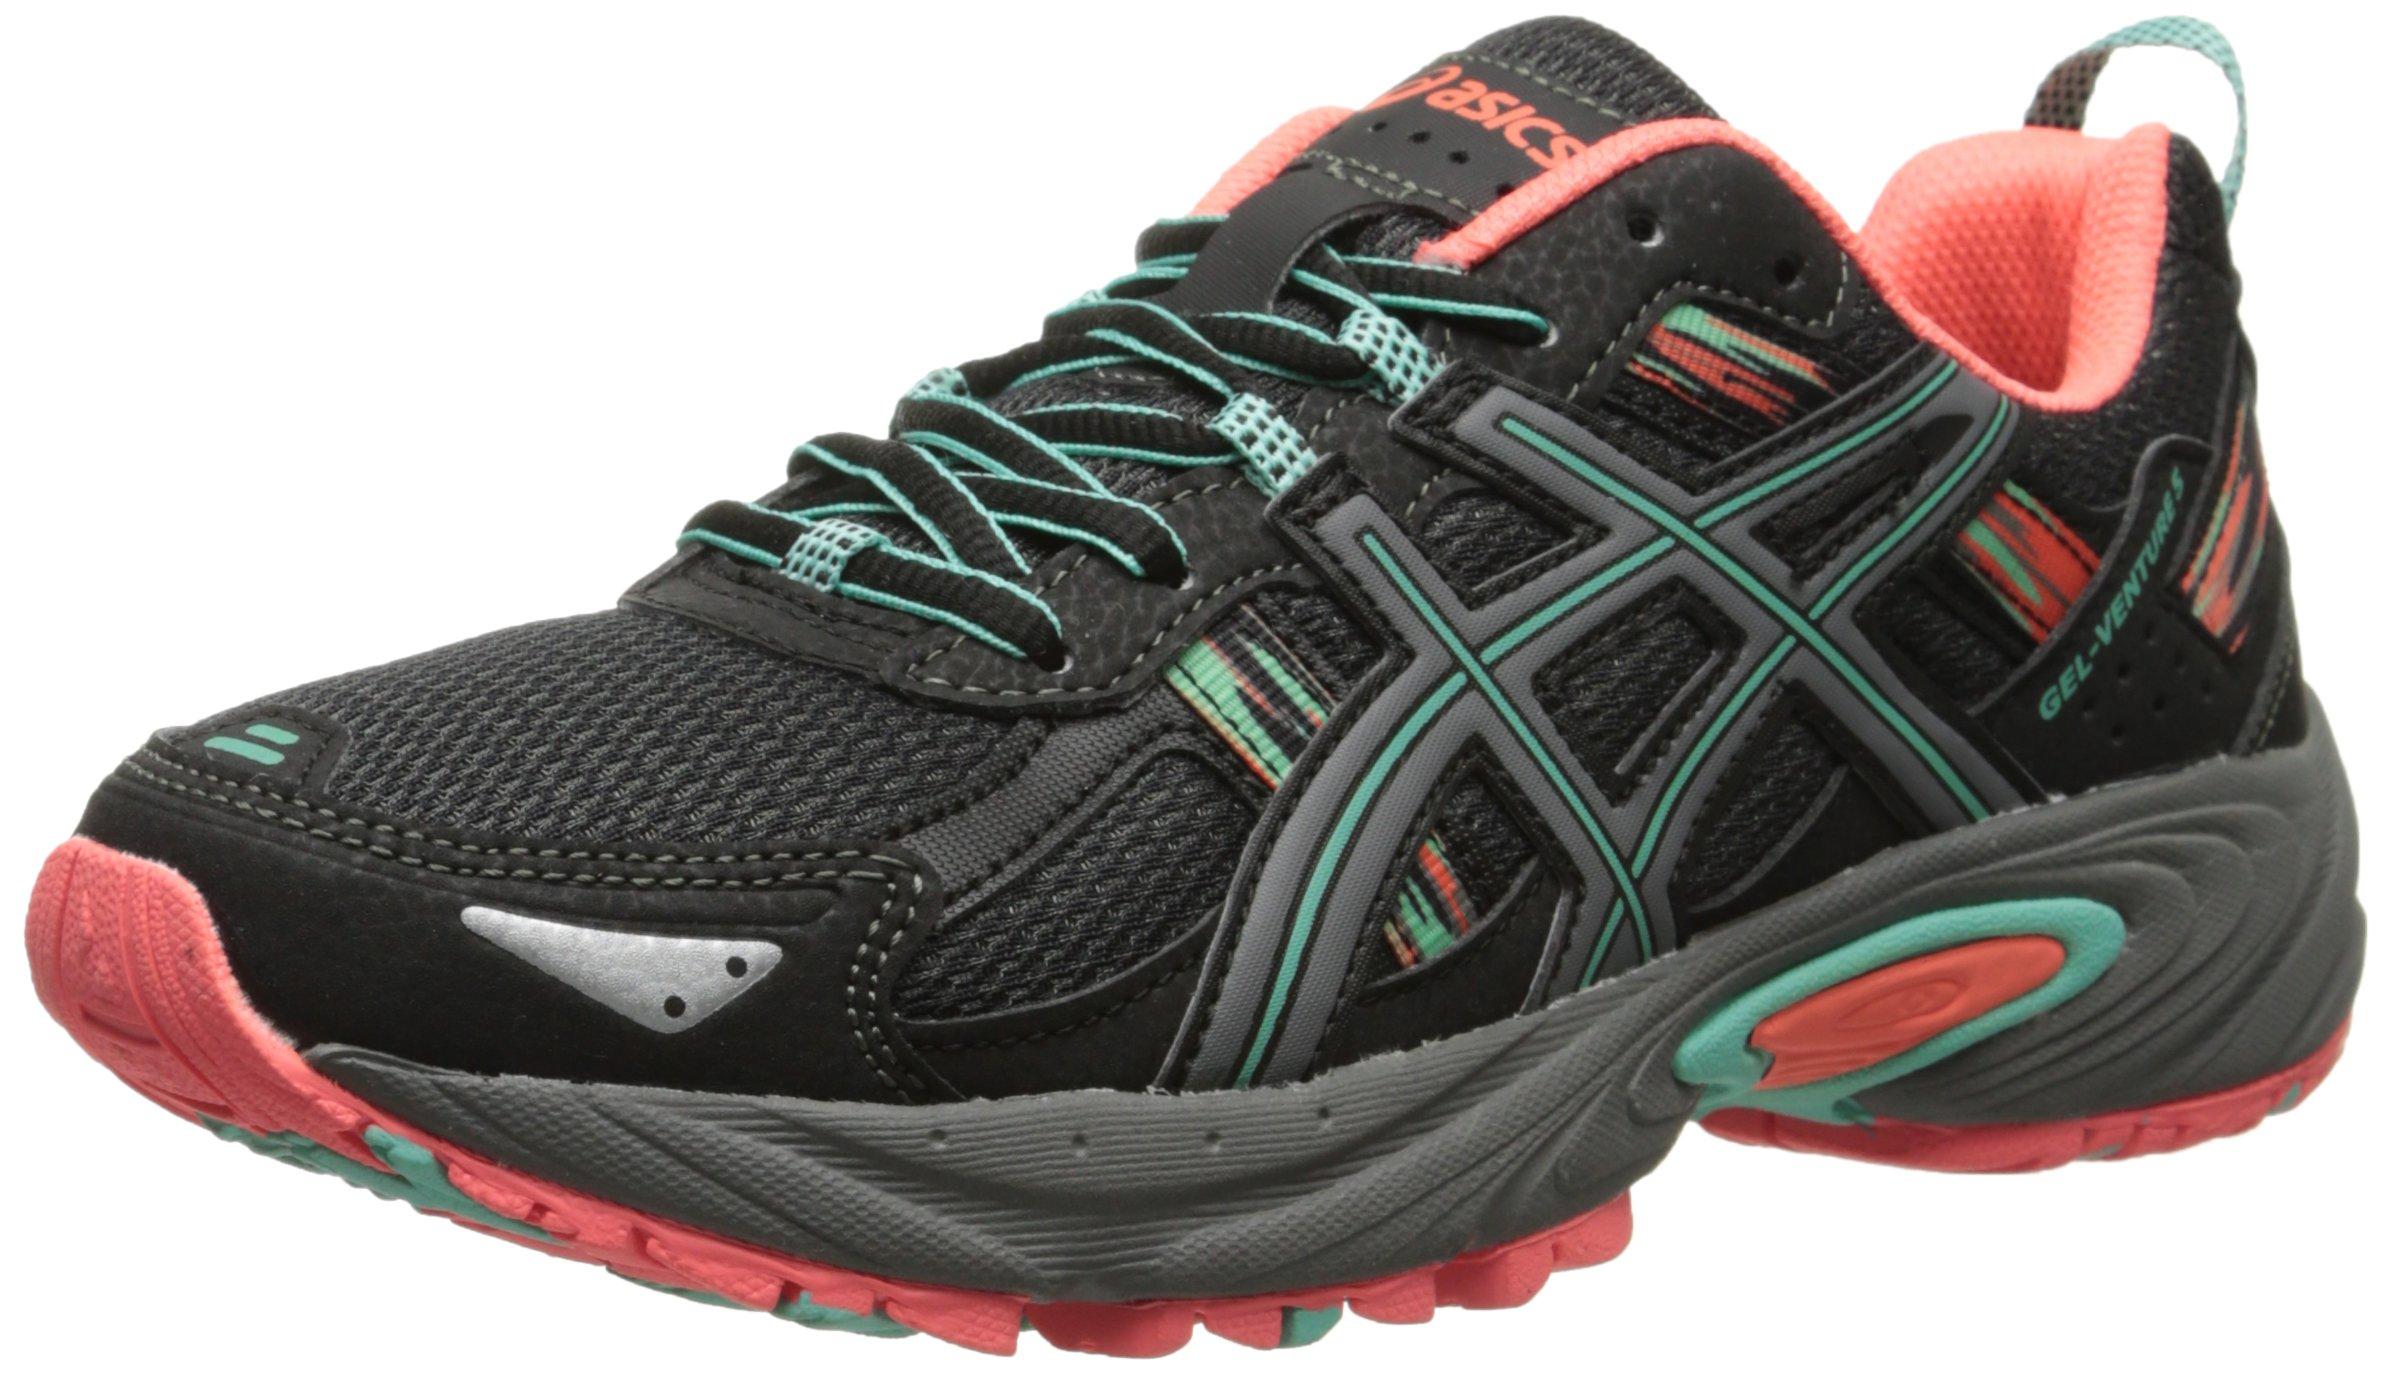 ASICS Women's Gel-venture 5 Running Shoe, Black/Aqua Mint/Flash Coral, 11 M US by ASICS